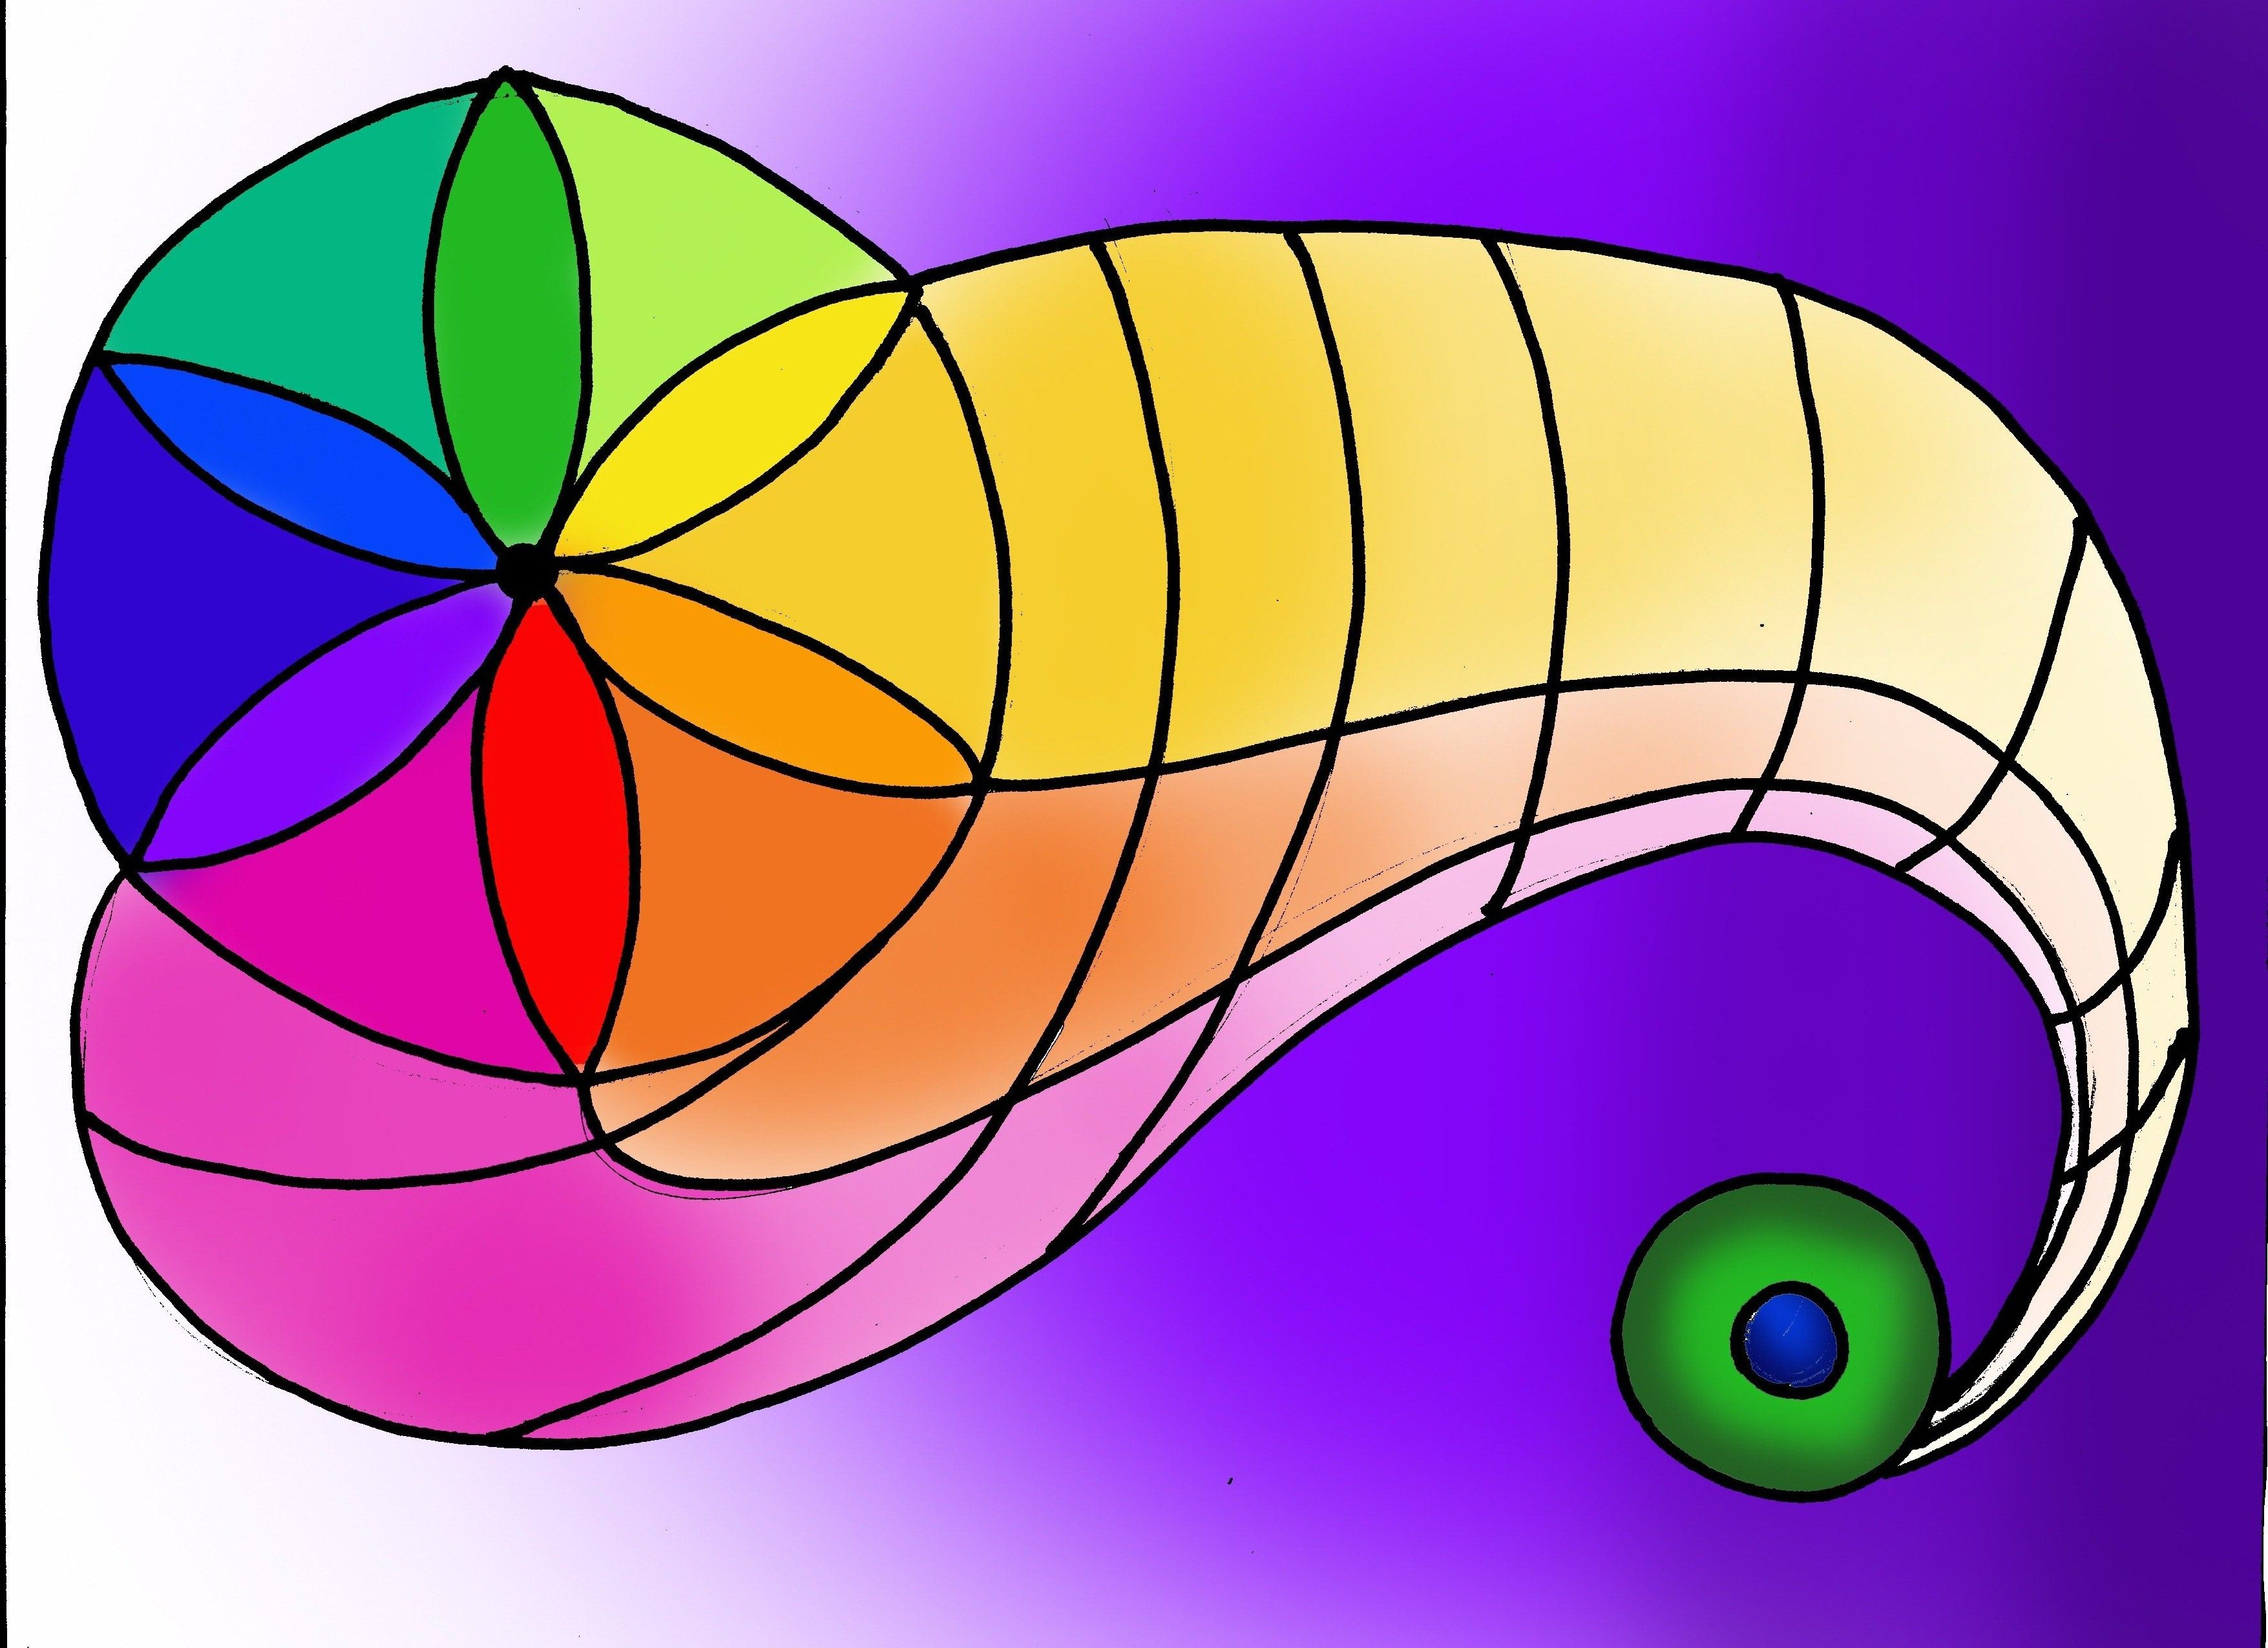 creative color wheel design elements and principles of. Black Bedroom Furniture Sets. Home Design Ideas